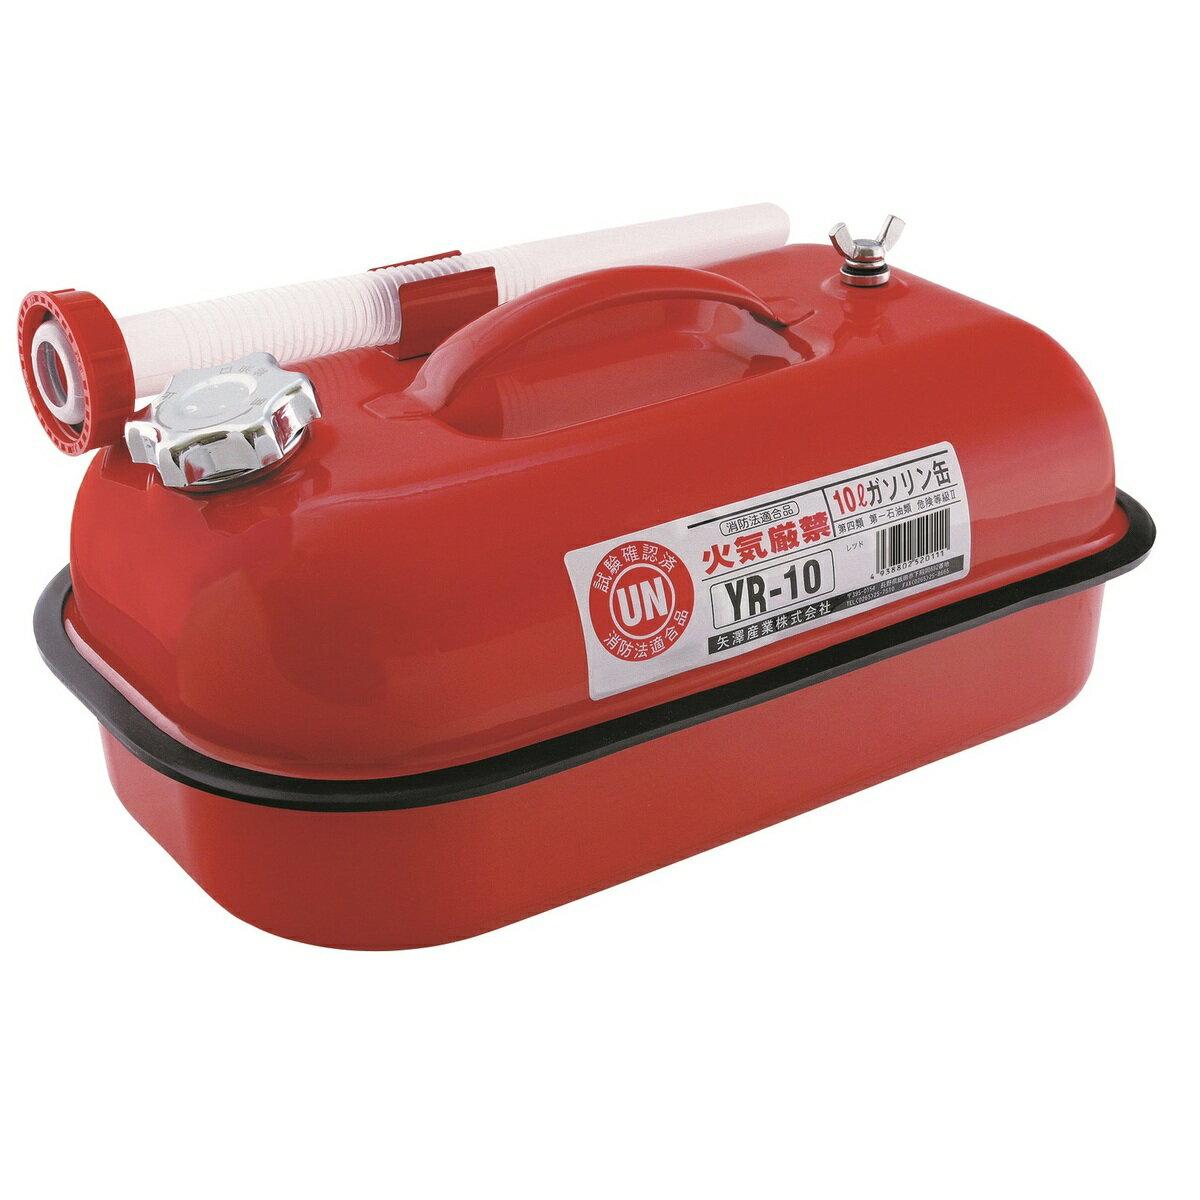 本物◆ 矢澤産業 ガソリン携行缶 超目玉 YR10 10L